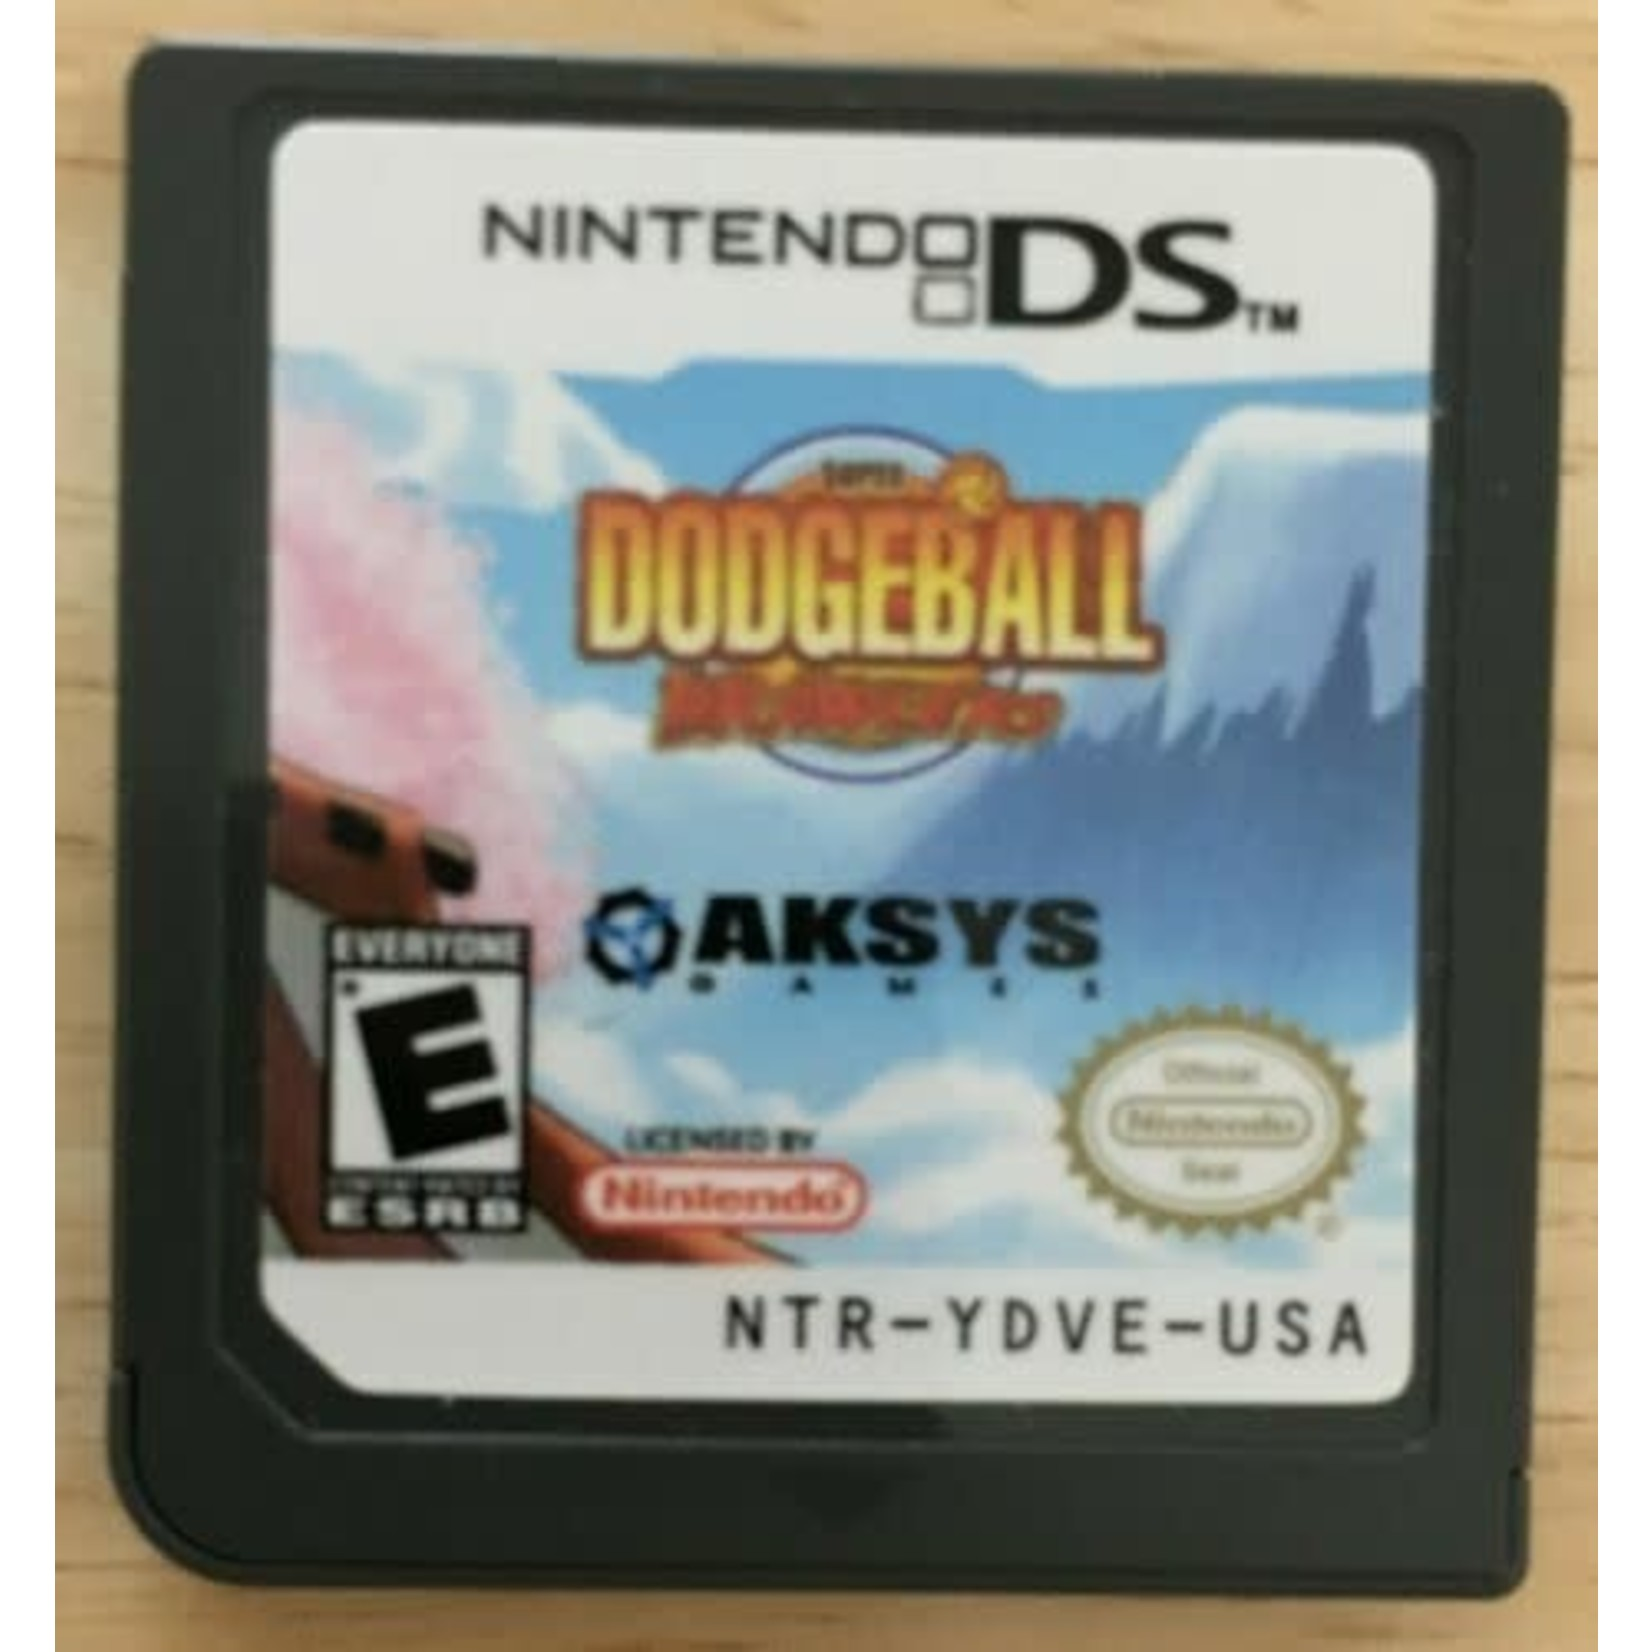 DSU-Super Dodgeball Brawlers (Chip Only)